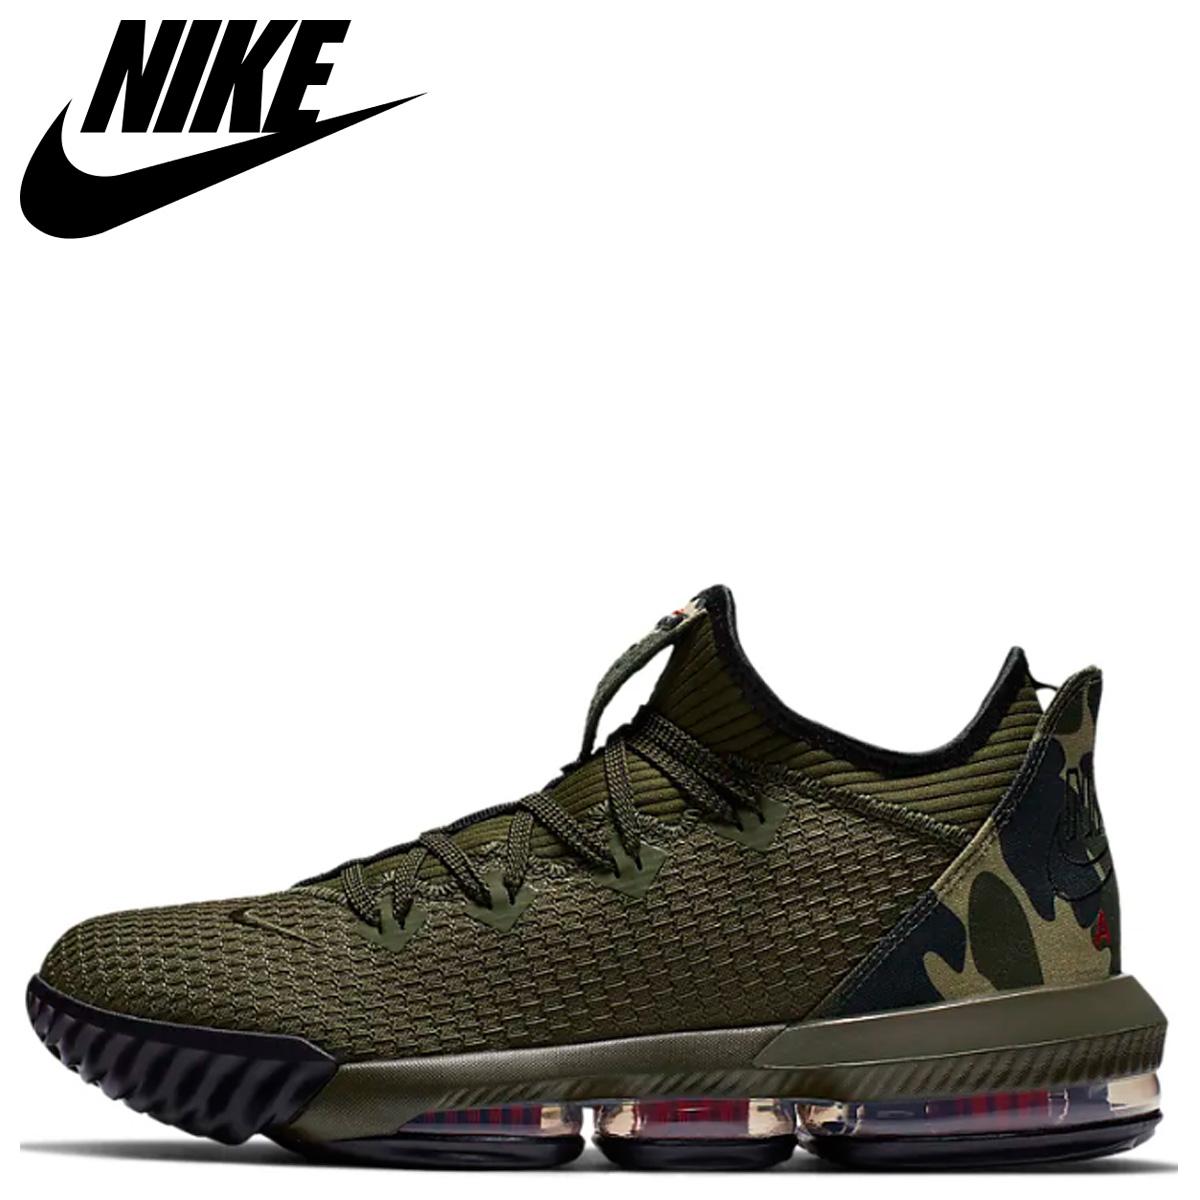 sports shoes 27ded d7014 NIKE LEBRON 16 LOW Nike Revlon 16 sneakers men camouflage khaki camo  CI2668-300